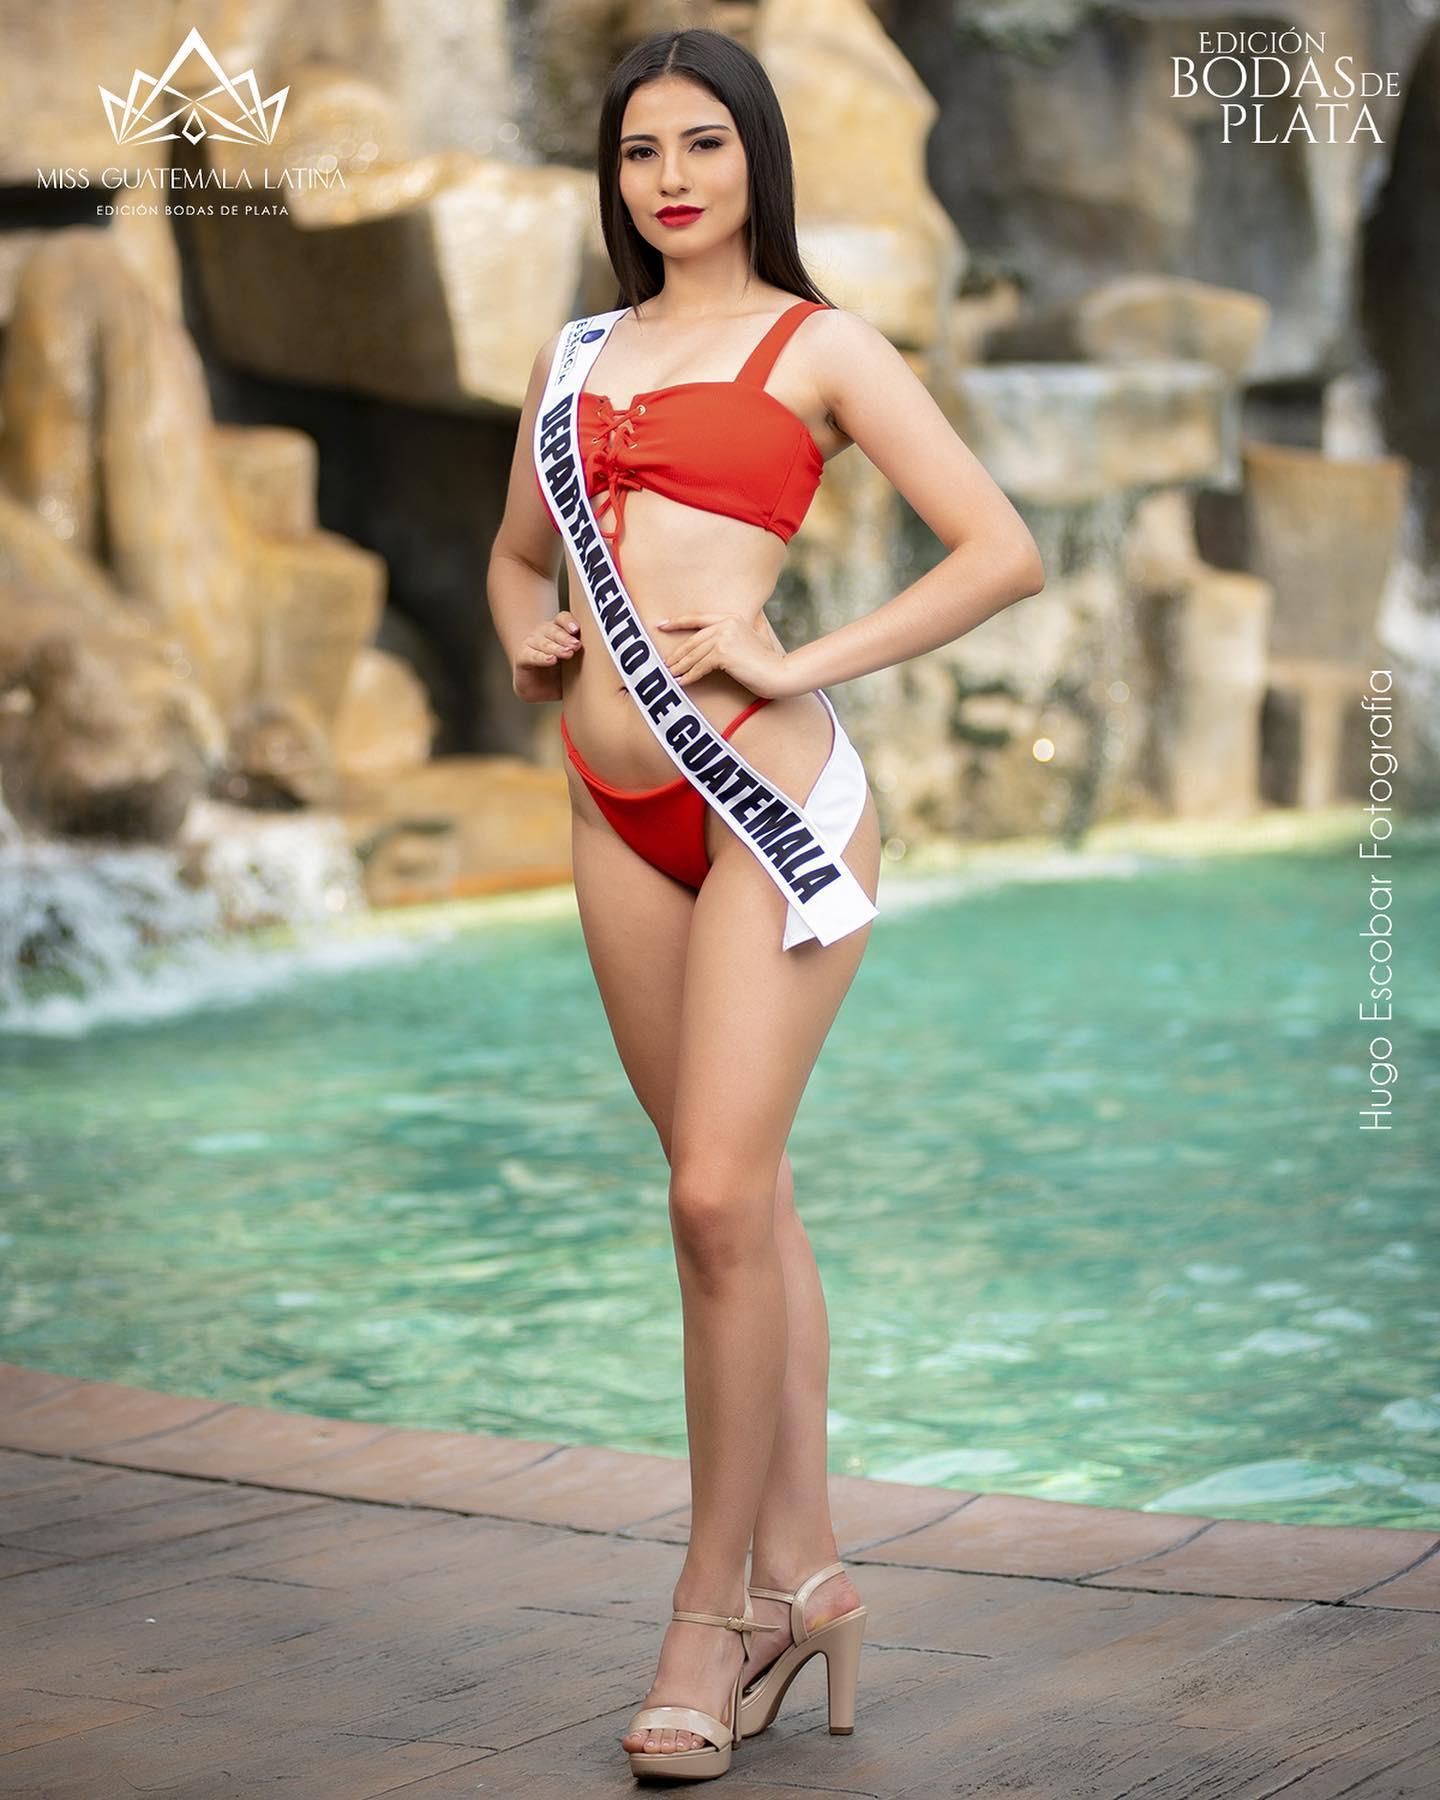 candidatas a miss guatemala latina 2021. final: 30 de abril. - Página 13 BBPcox